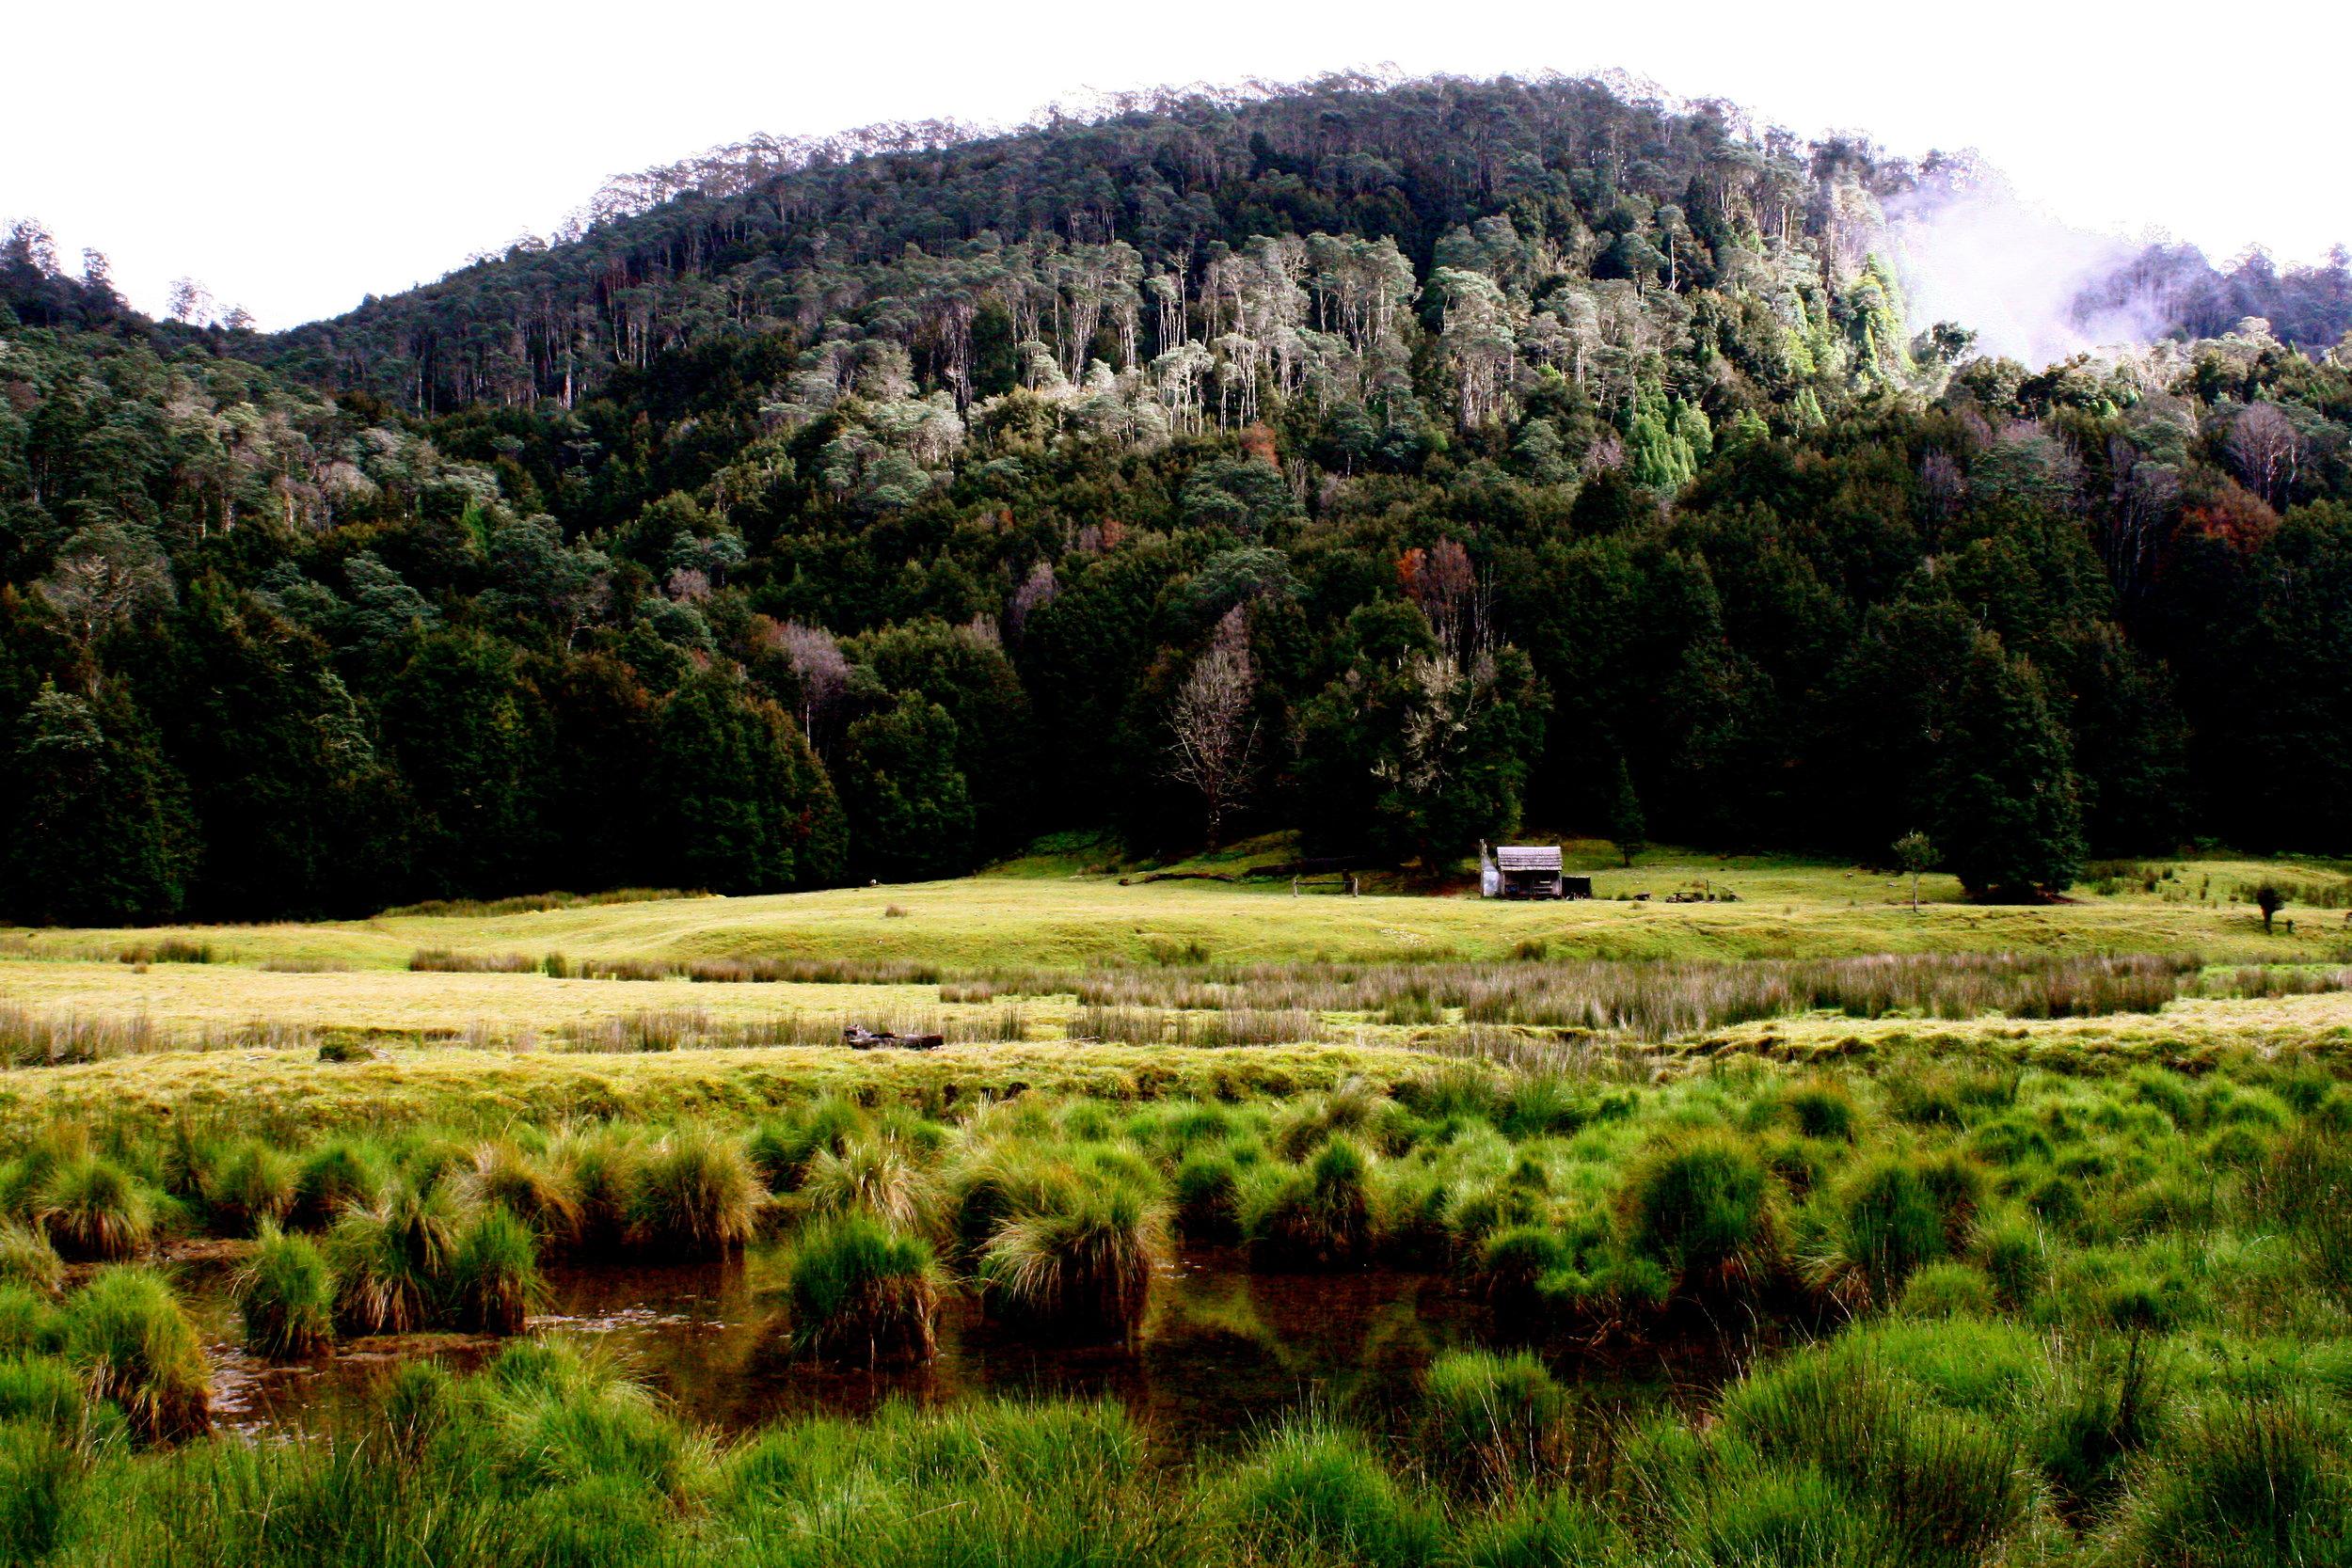 The contrasting landscape